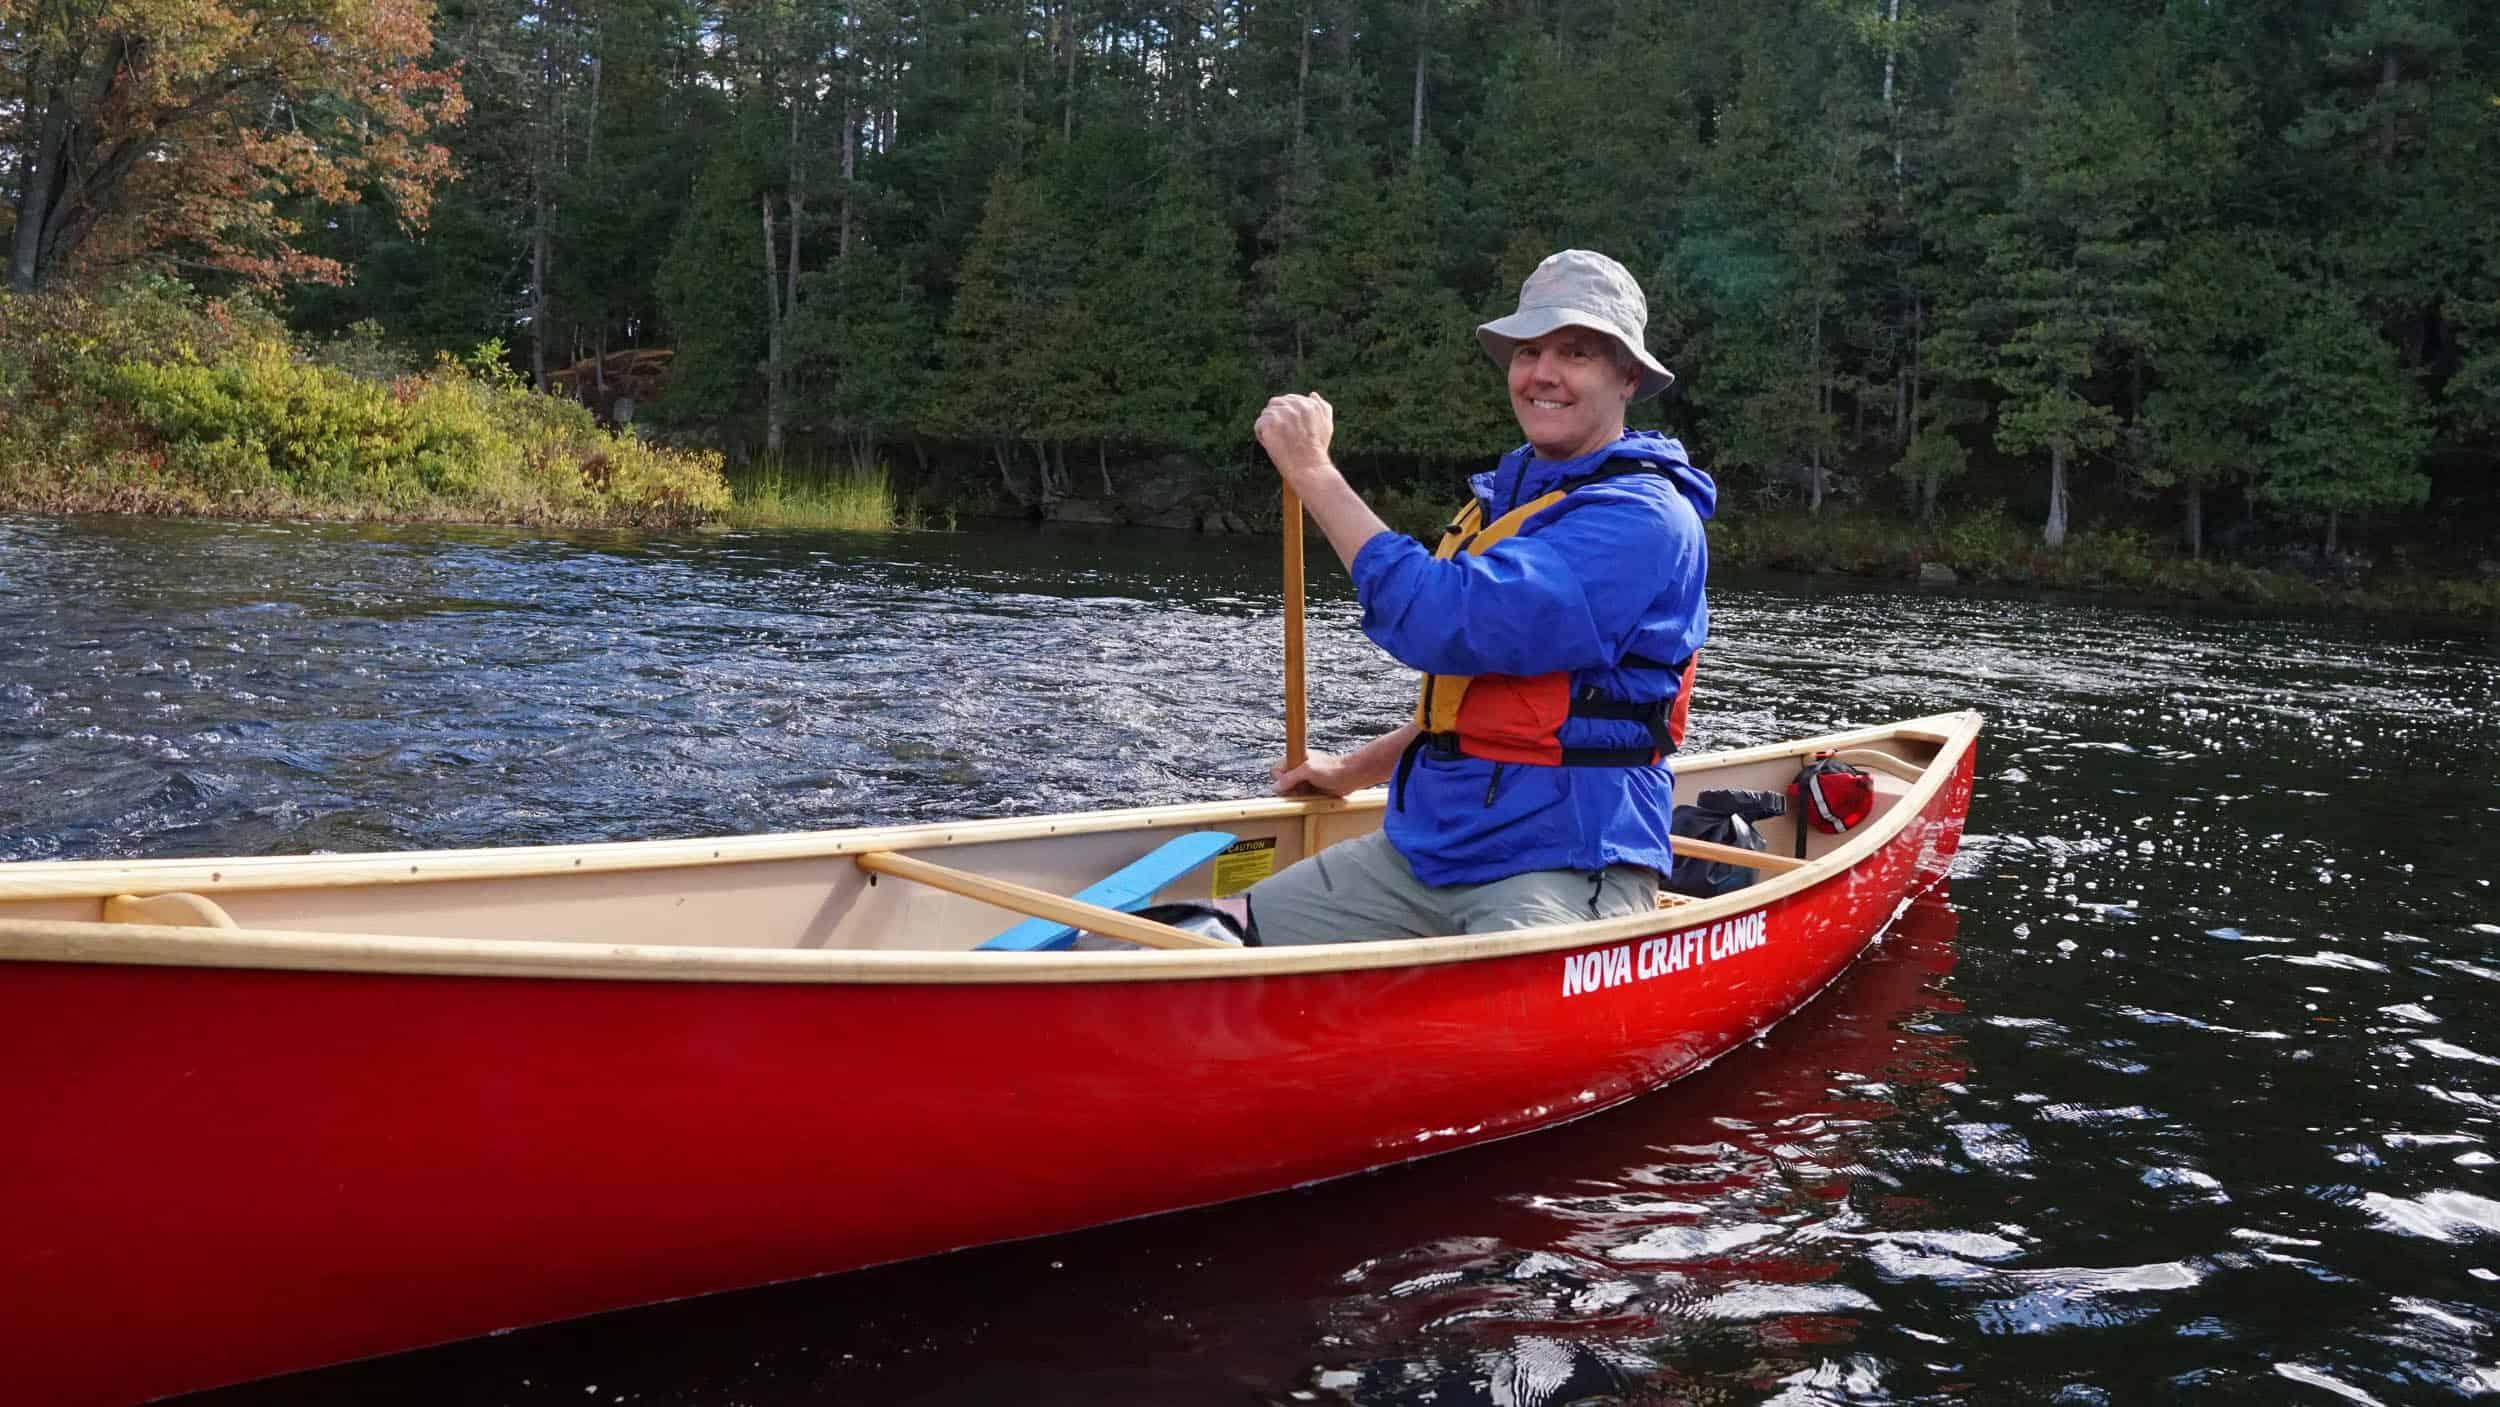 Prospector 15 canoe